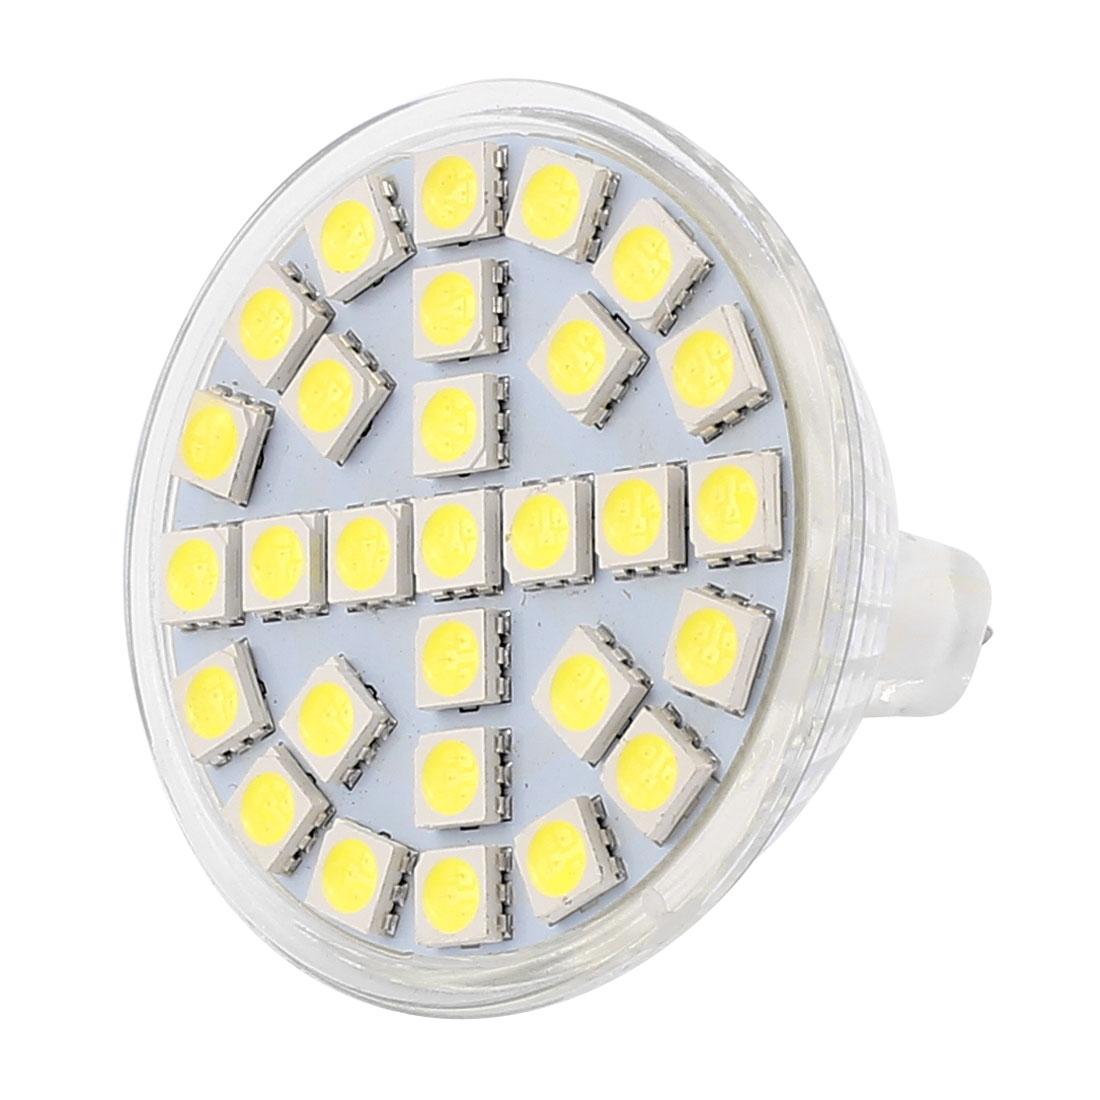 MR16 SMD5050 29LEDs AC 110V 5W Glass Energy Saving LED Spotlight Lamp Bulb White